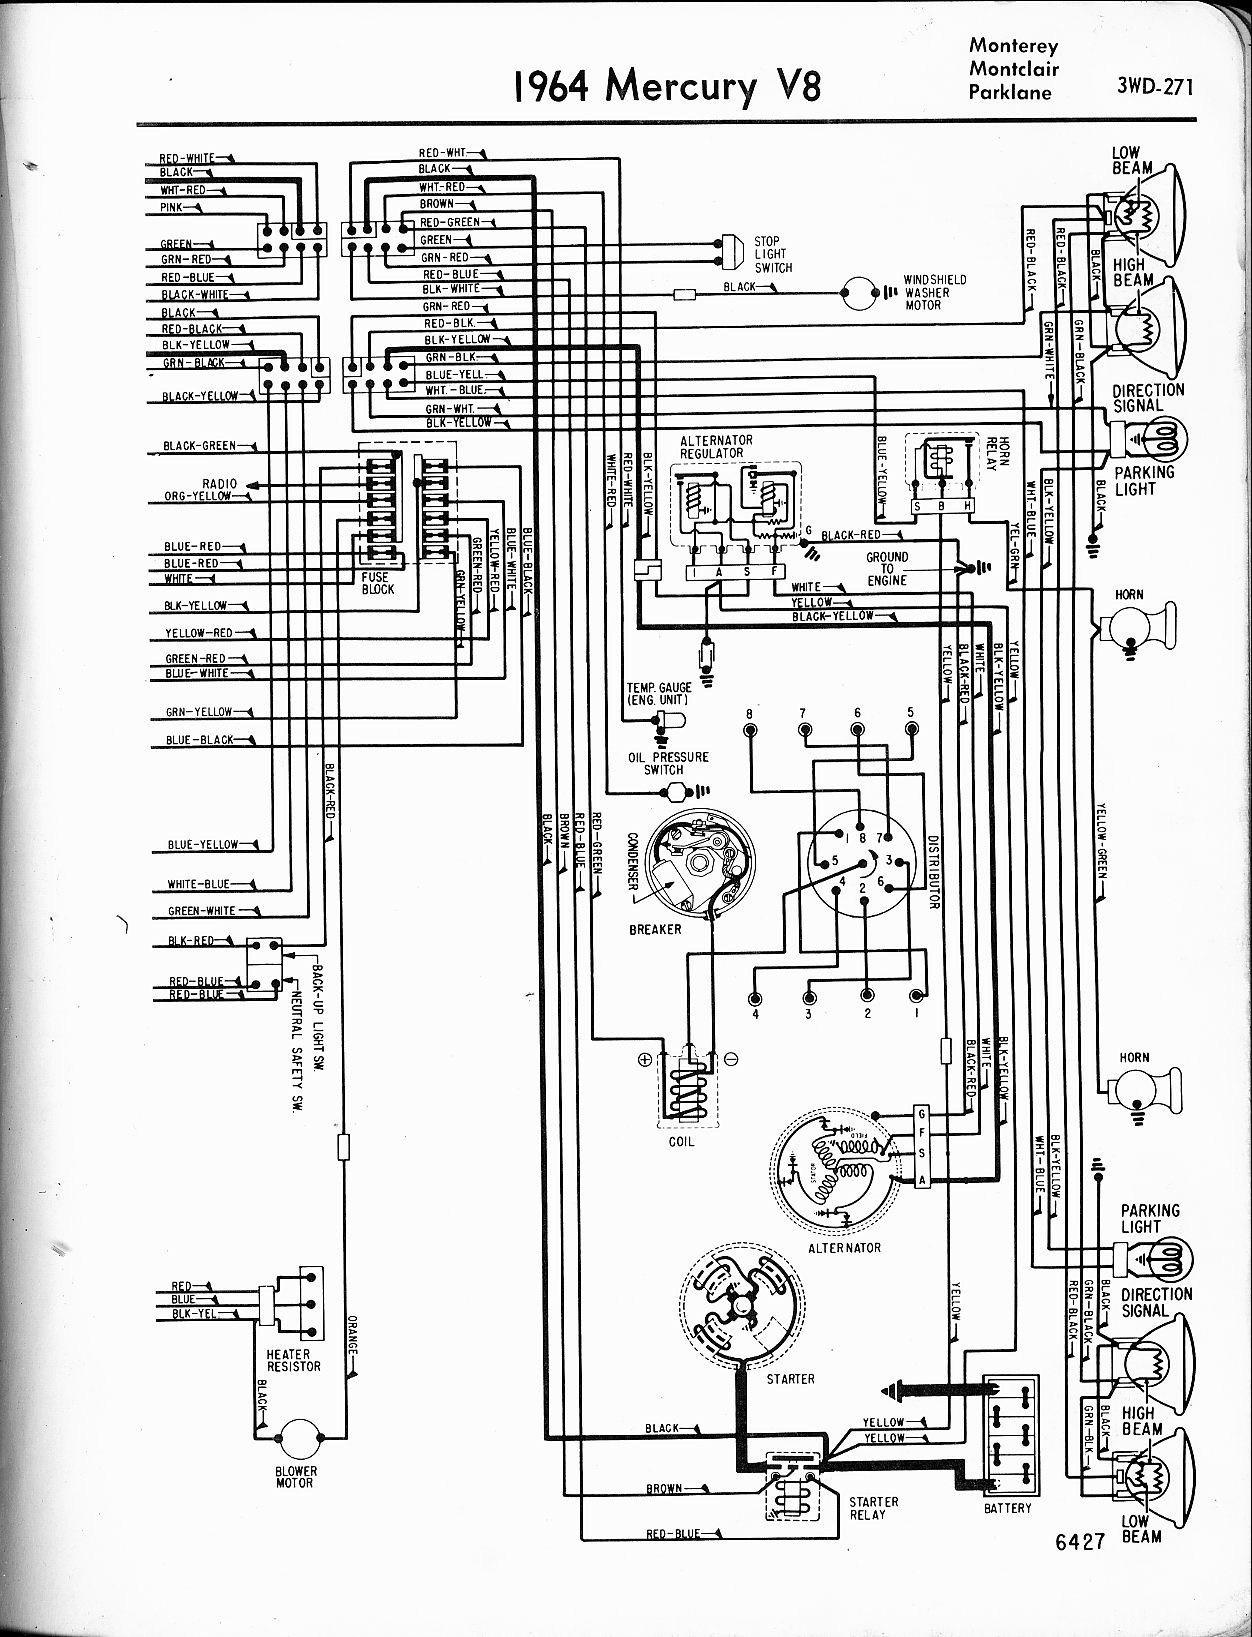 Indmar Wiring Harness Diagram - All Wiring Diagram Data - Yamaha Outboard Wiring Harness Diagram